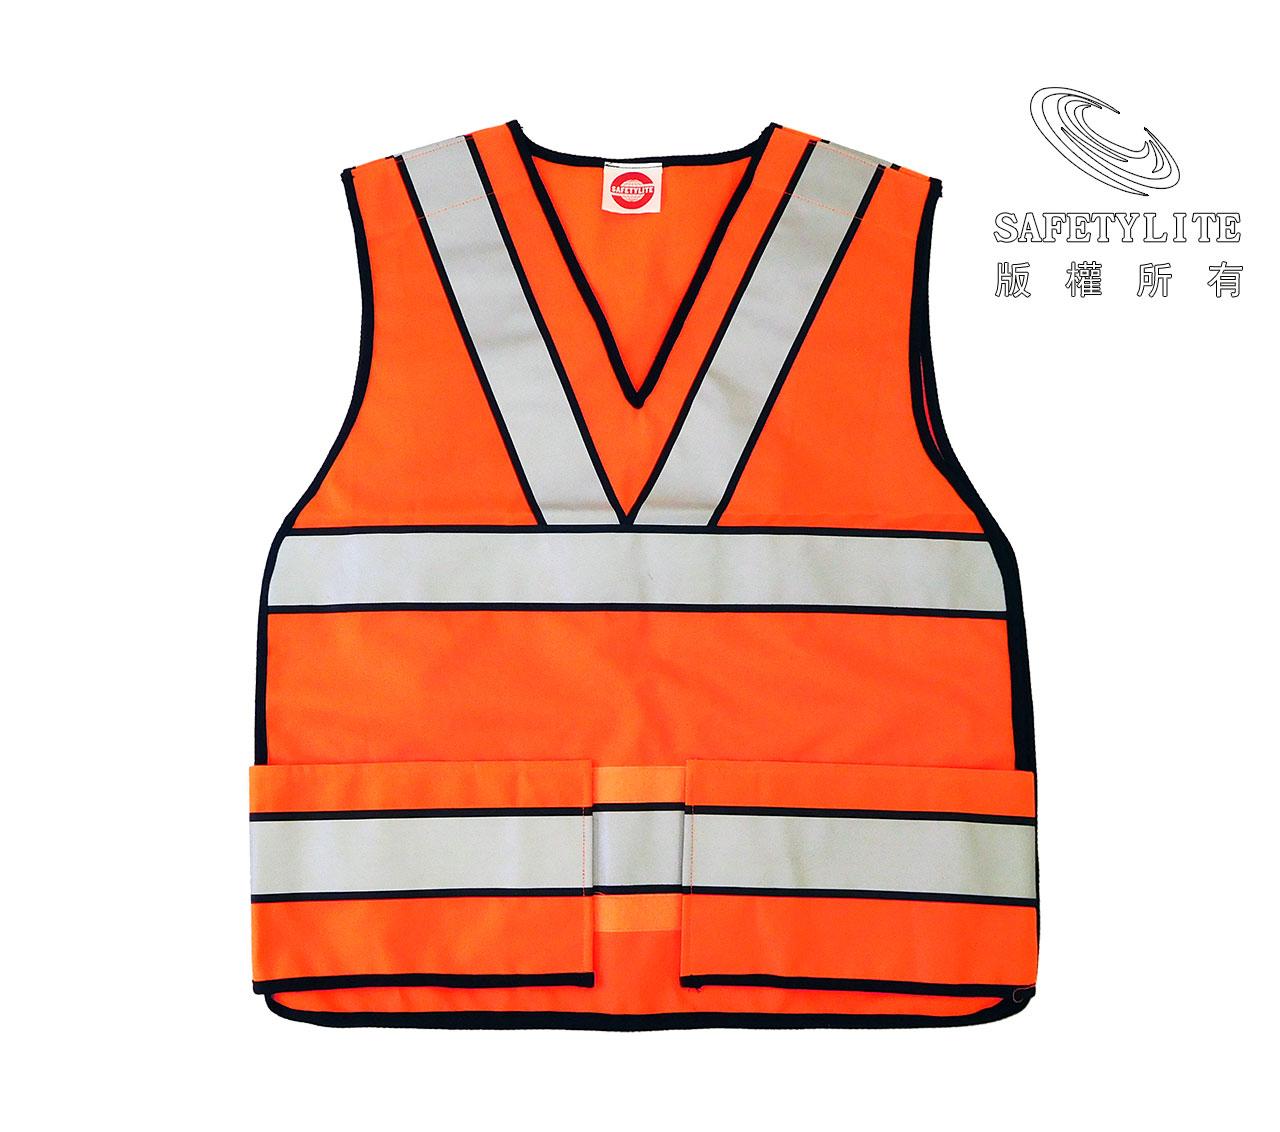 【safetylite 安心生活館】《滿額免運.贈禮.加line折百》黏貼二片式反光安全背心/方便脫跳救生(可團購)-3M Scotchlite™